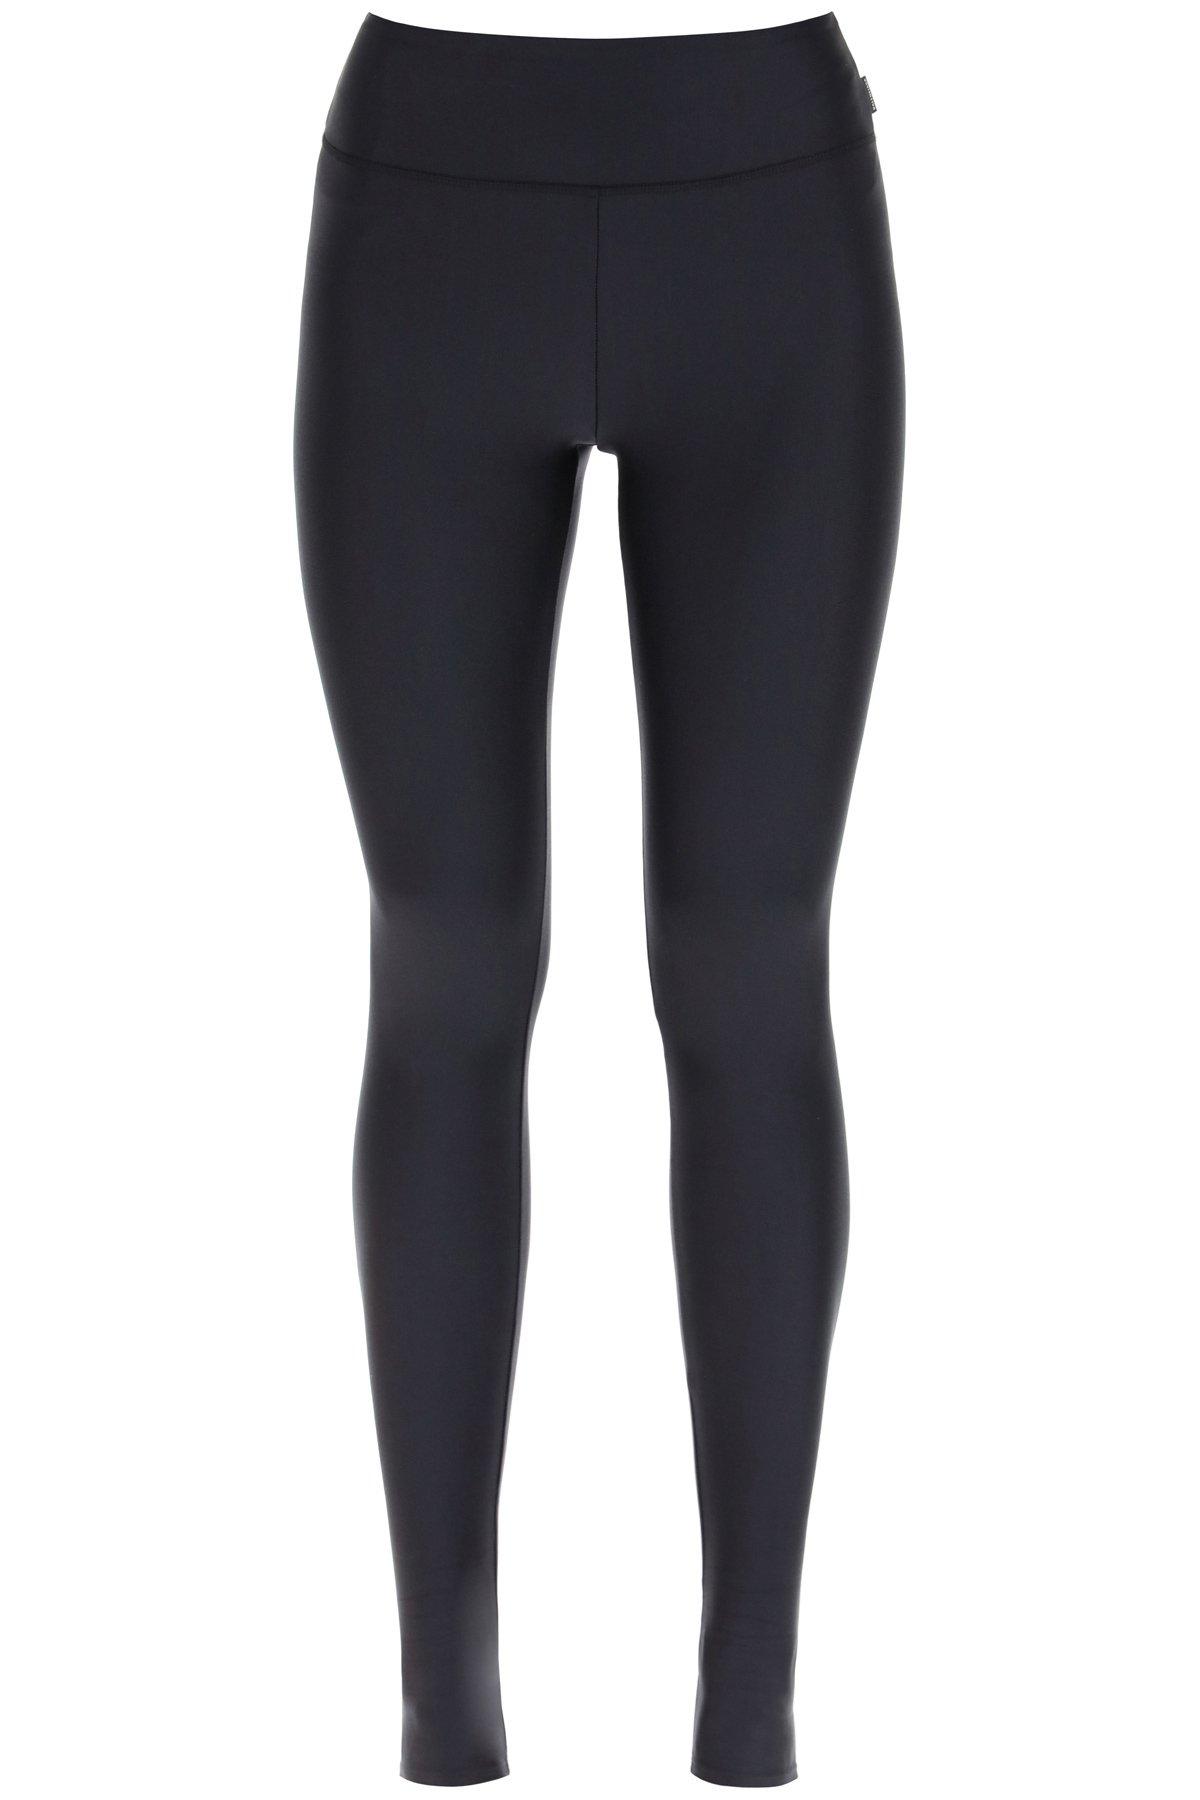 Balenciaga leggings dynasty